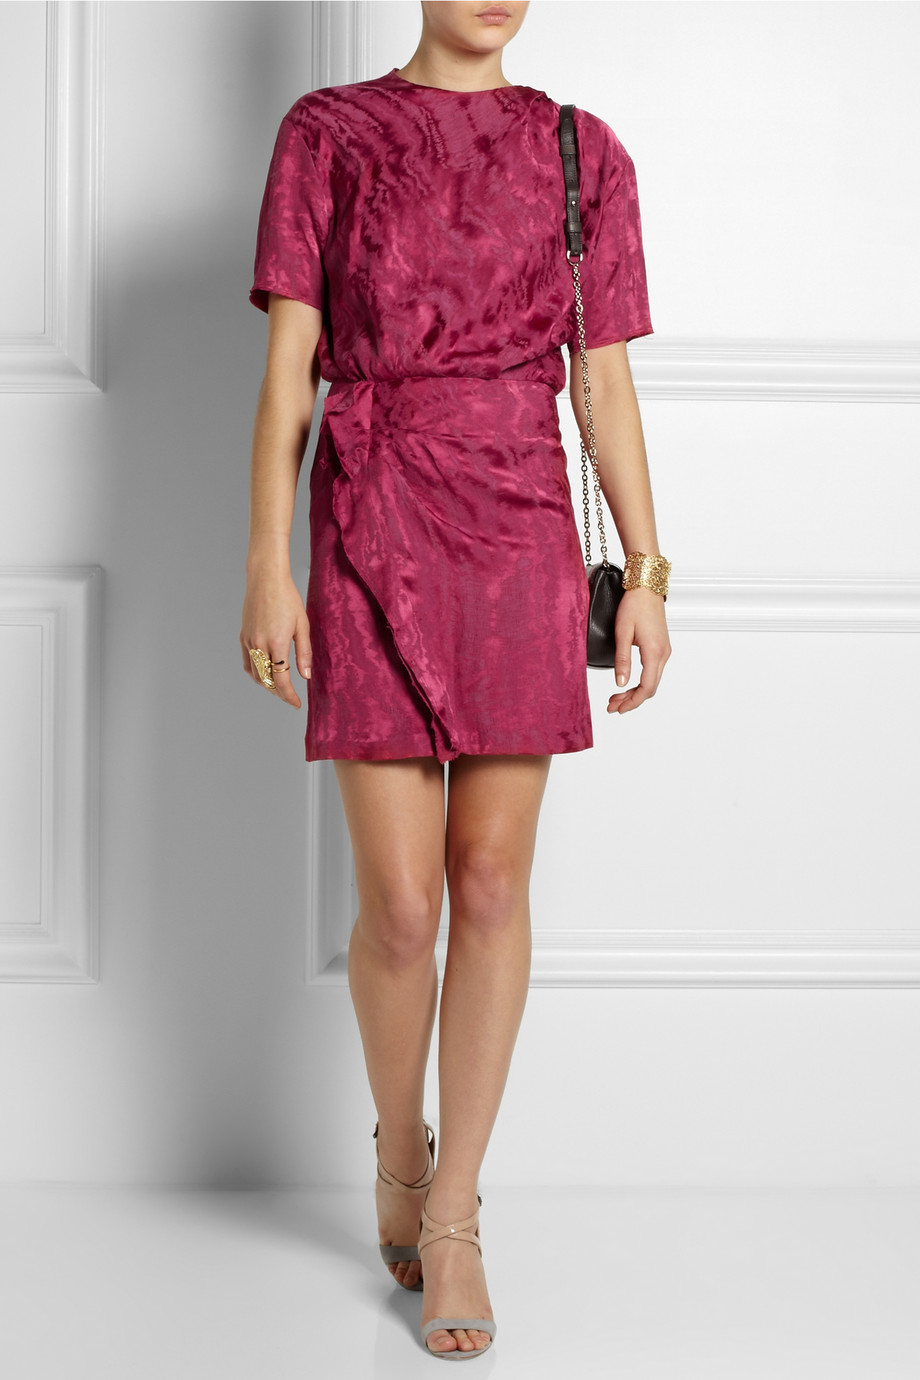 dc7ad9a8944 Isabel Marant Yann Moiré Mini Dress in Pink - Lyst